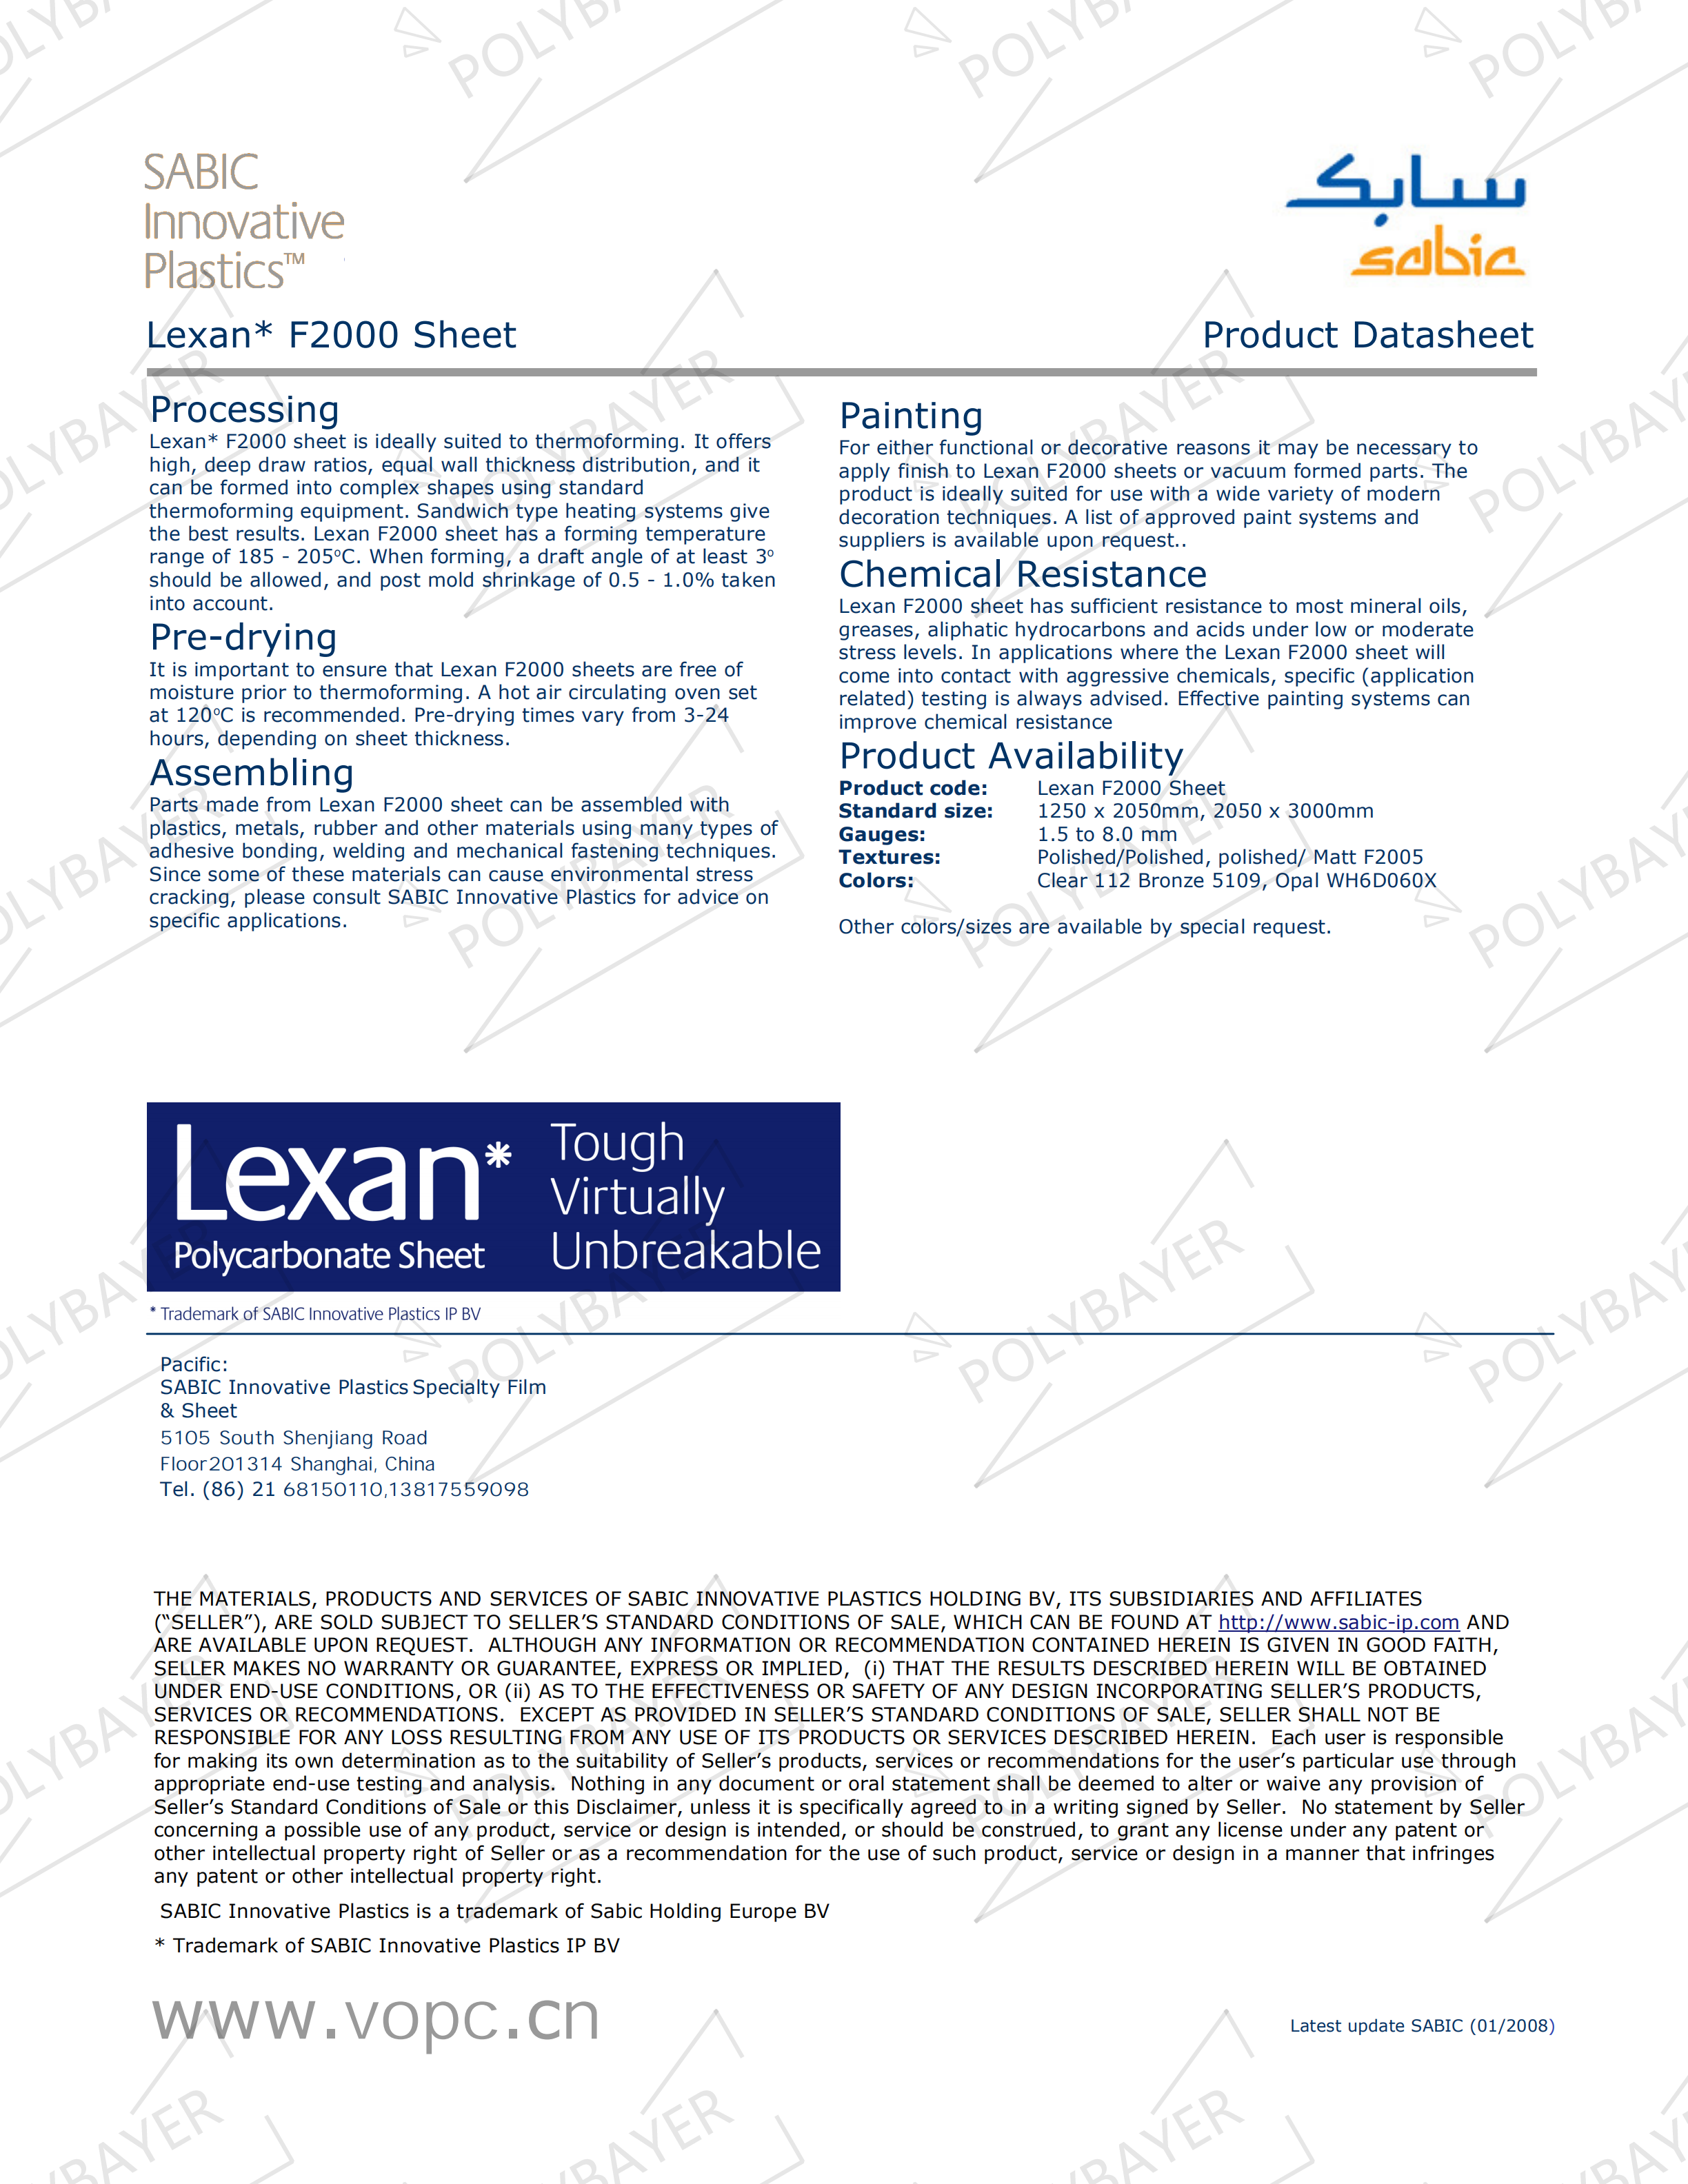 V0級阻燃PC板,Lexan F2000 sheet-SABIC,F2000,沙伯F2000,Lexan F2000聚碳酸酯板UL94檢測報告,V0防火檢測屬性參數,F2000物性參數表圖2